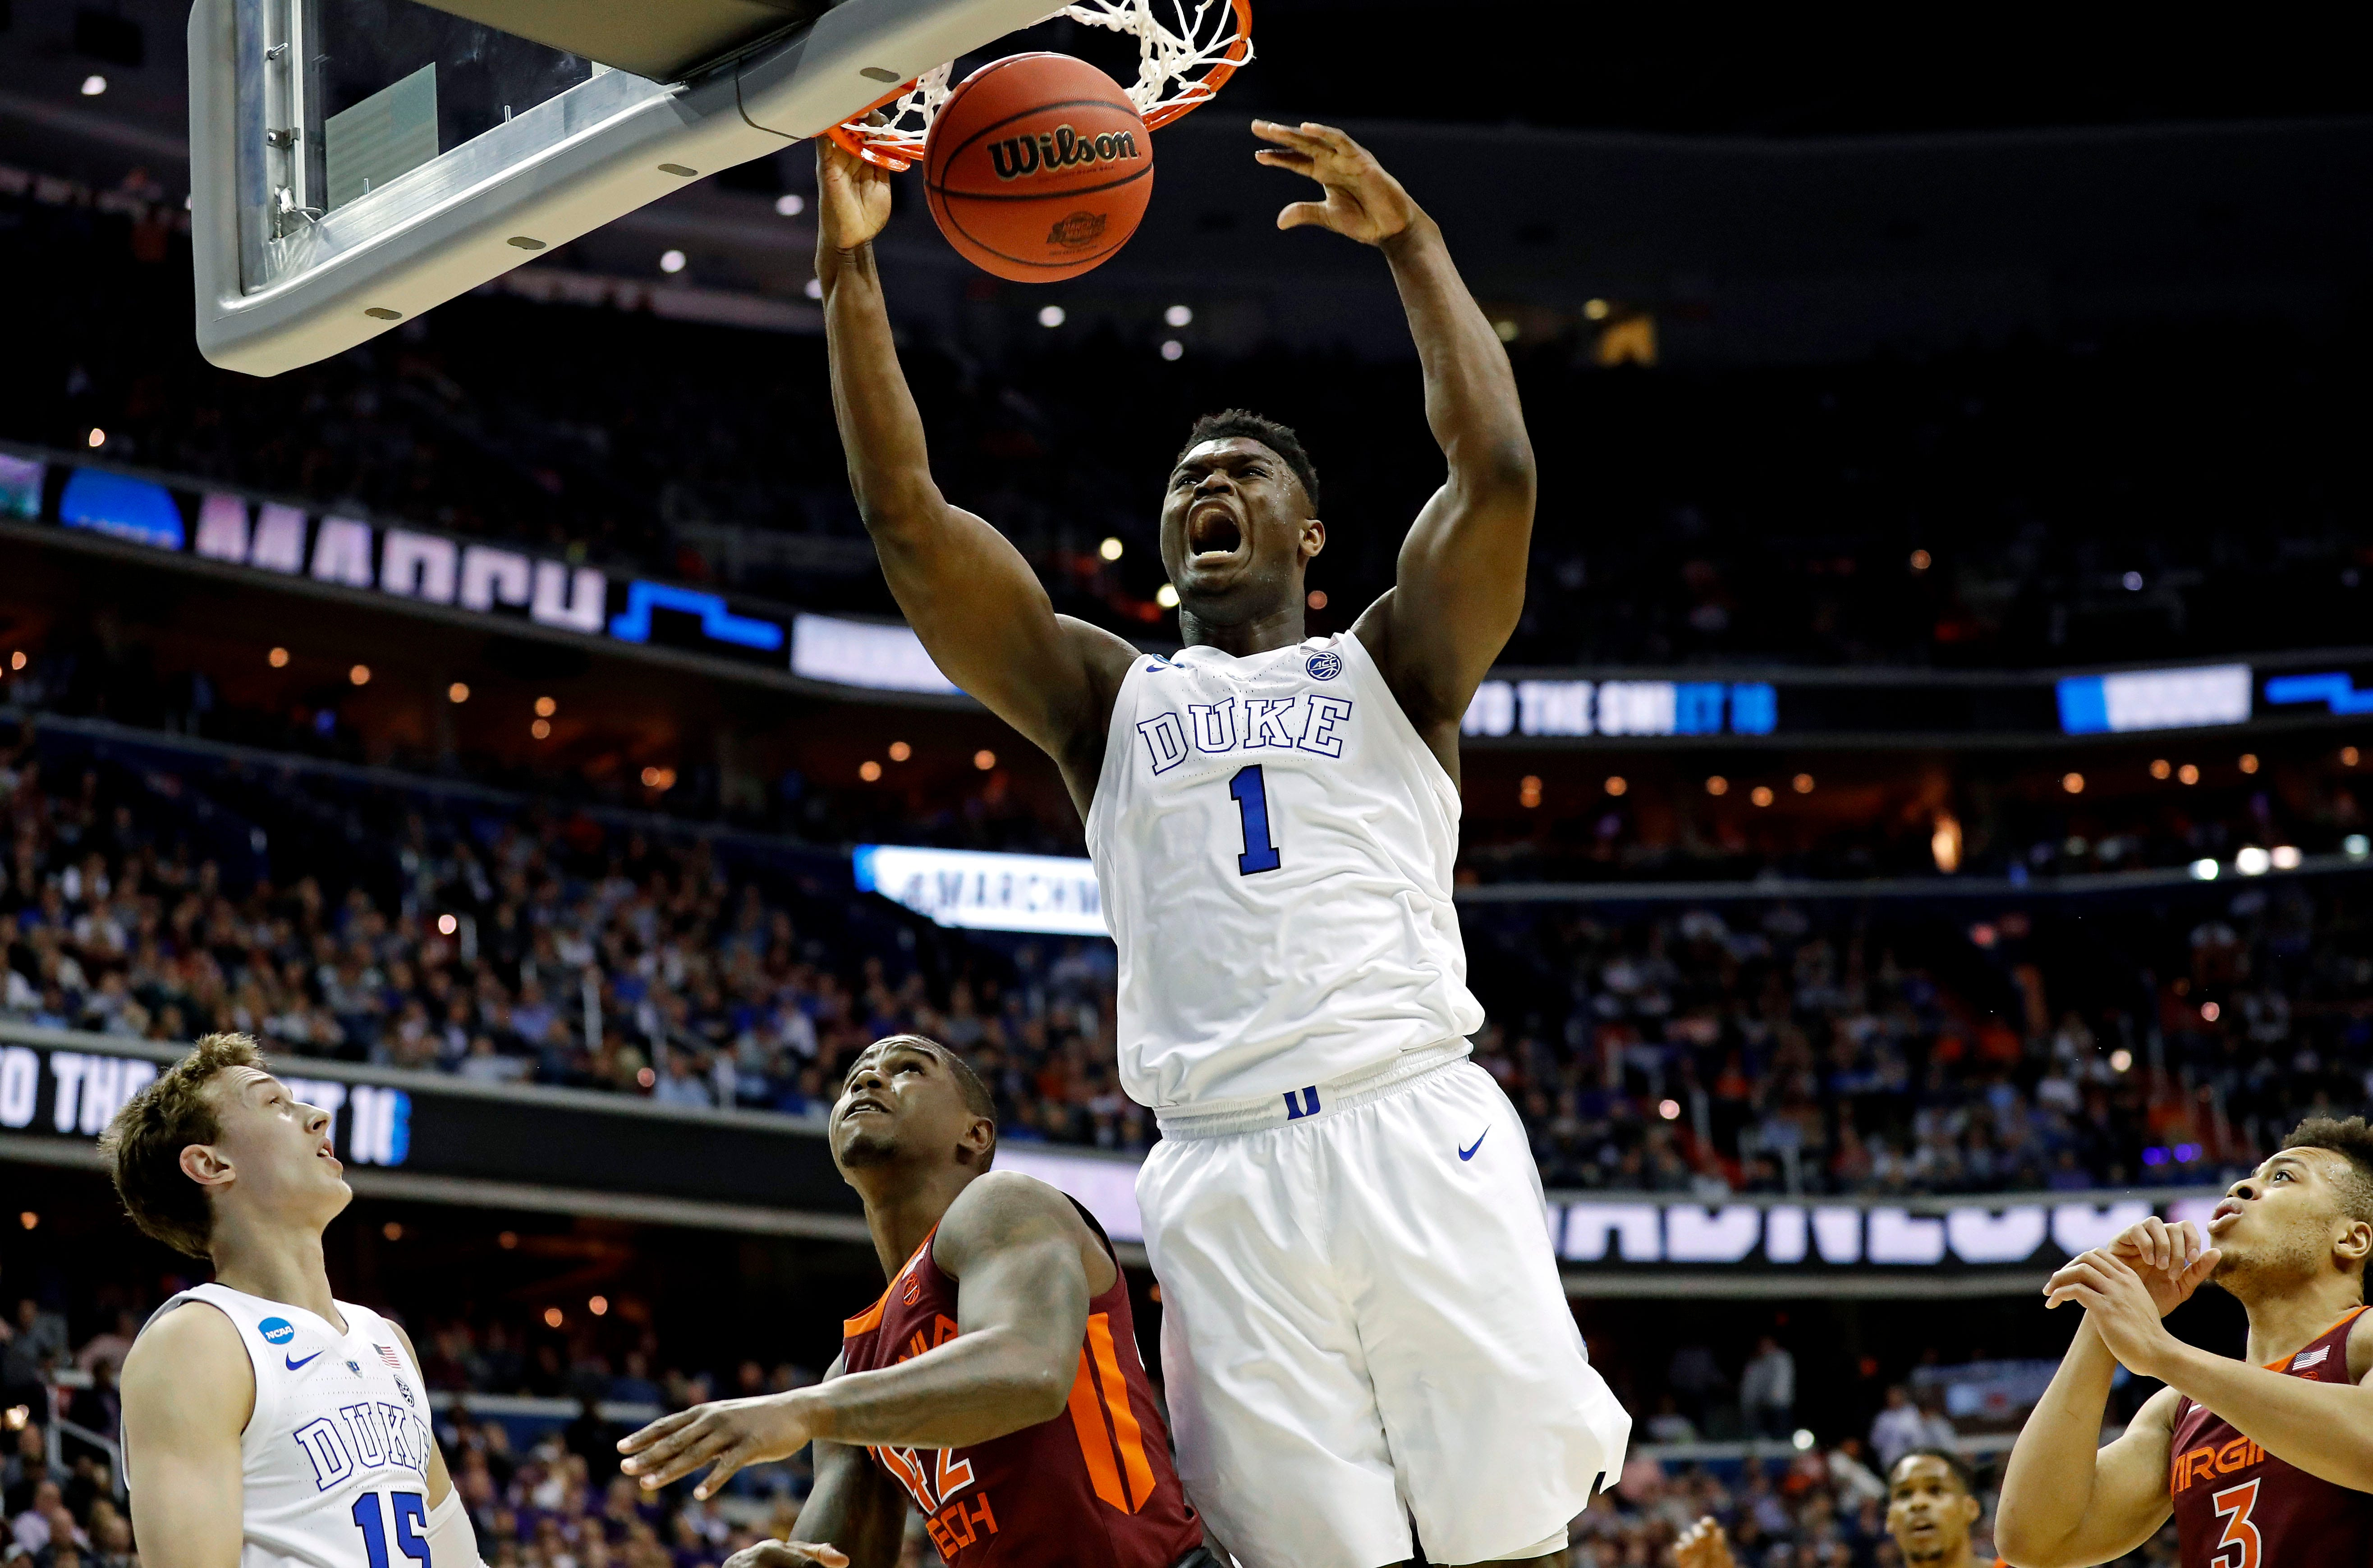 Duke forward Zion Williamson dunks the ball against Virginia Tech during the Sweet 16 of the 2019 NCAA tournament.